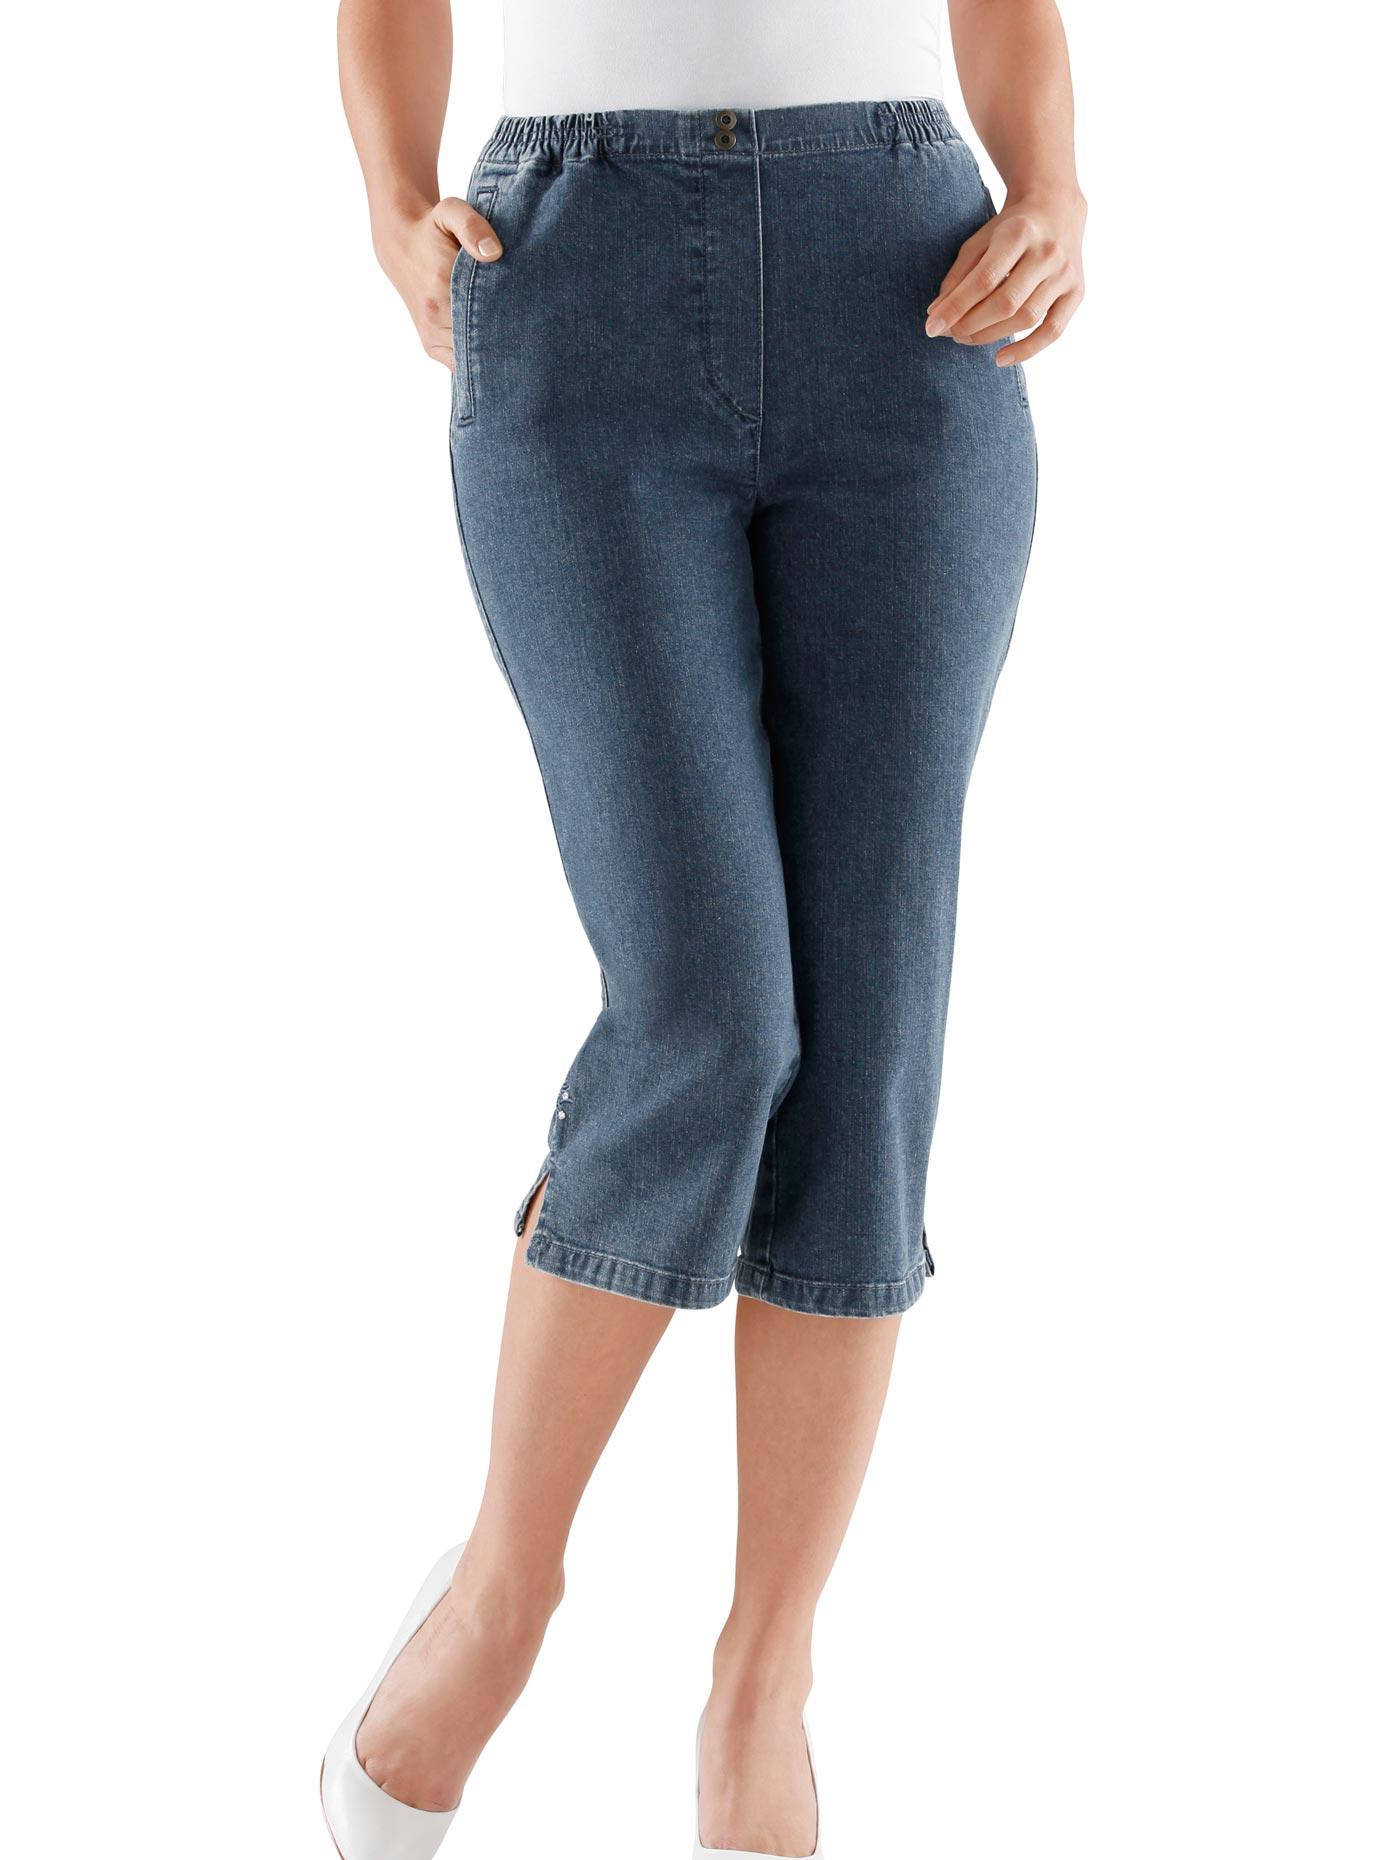 Classic Basics Capri-Jeans mit bequemem Rundum-Dehnbund | Bekleidung > Jeans > Caprijeans | Blau | Jeans | Classic Basics